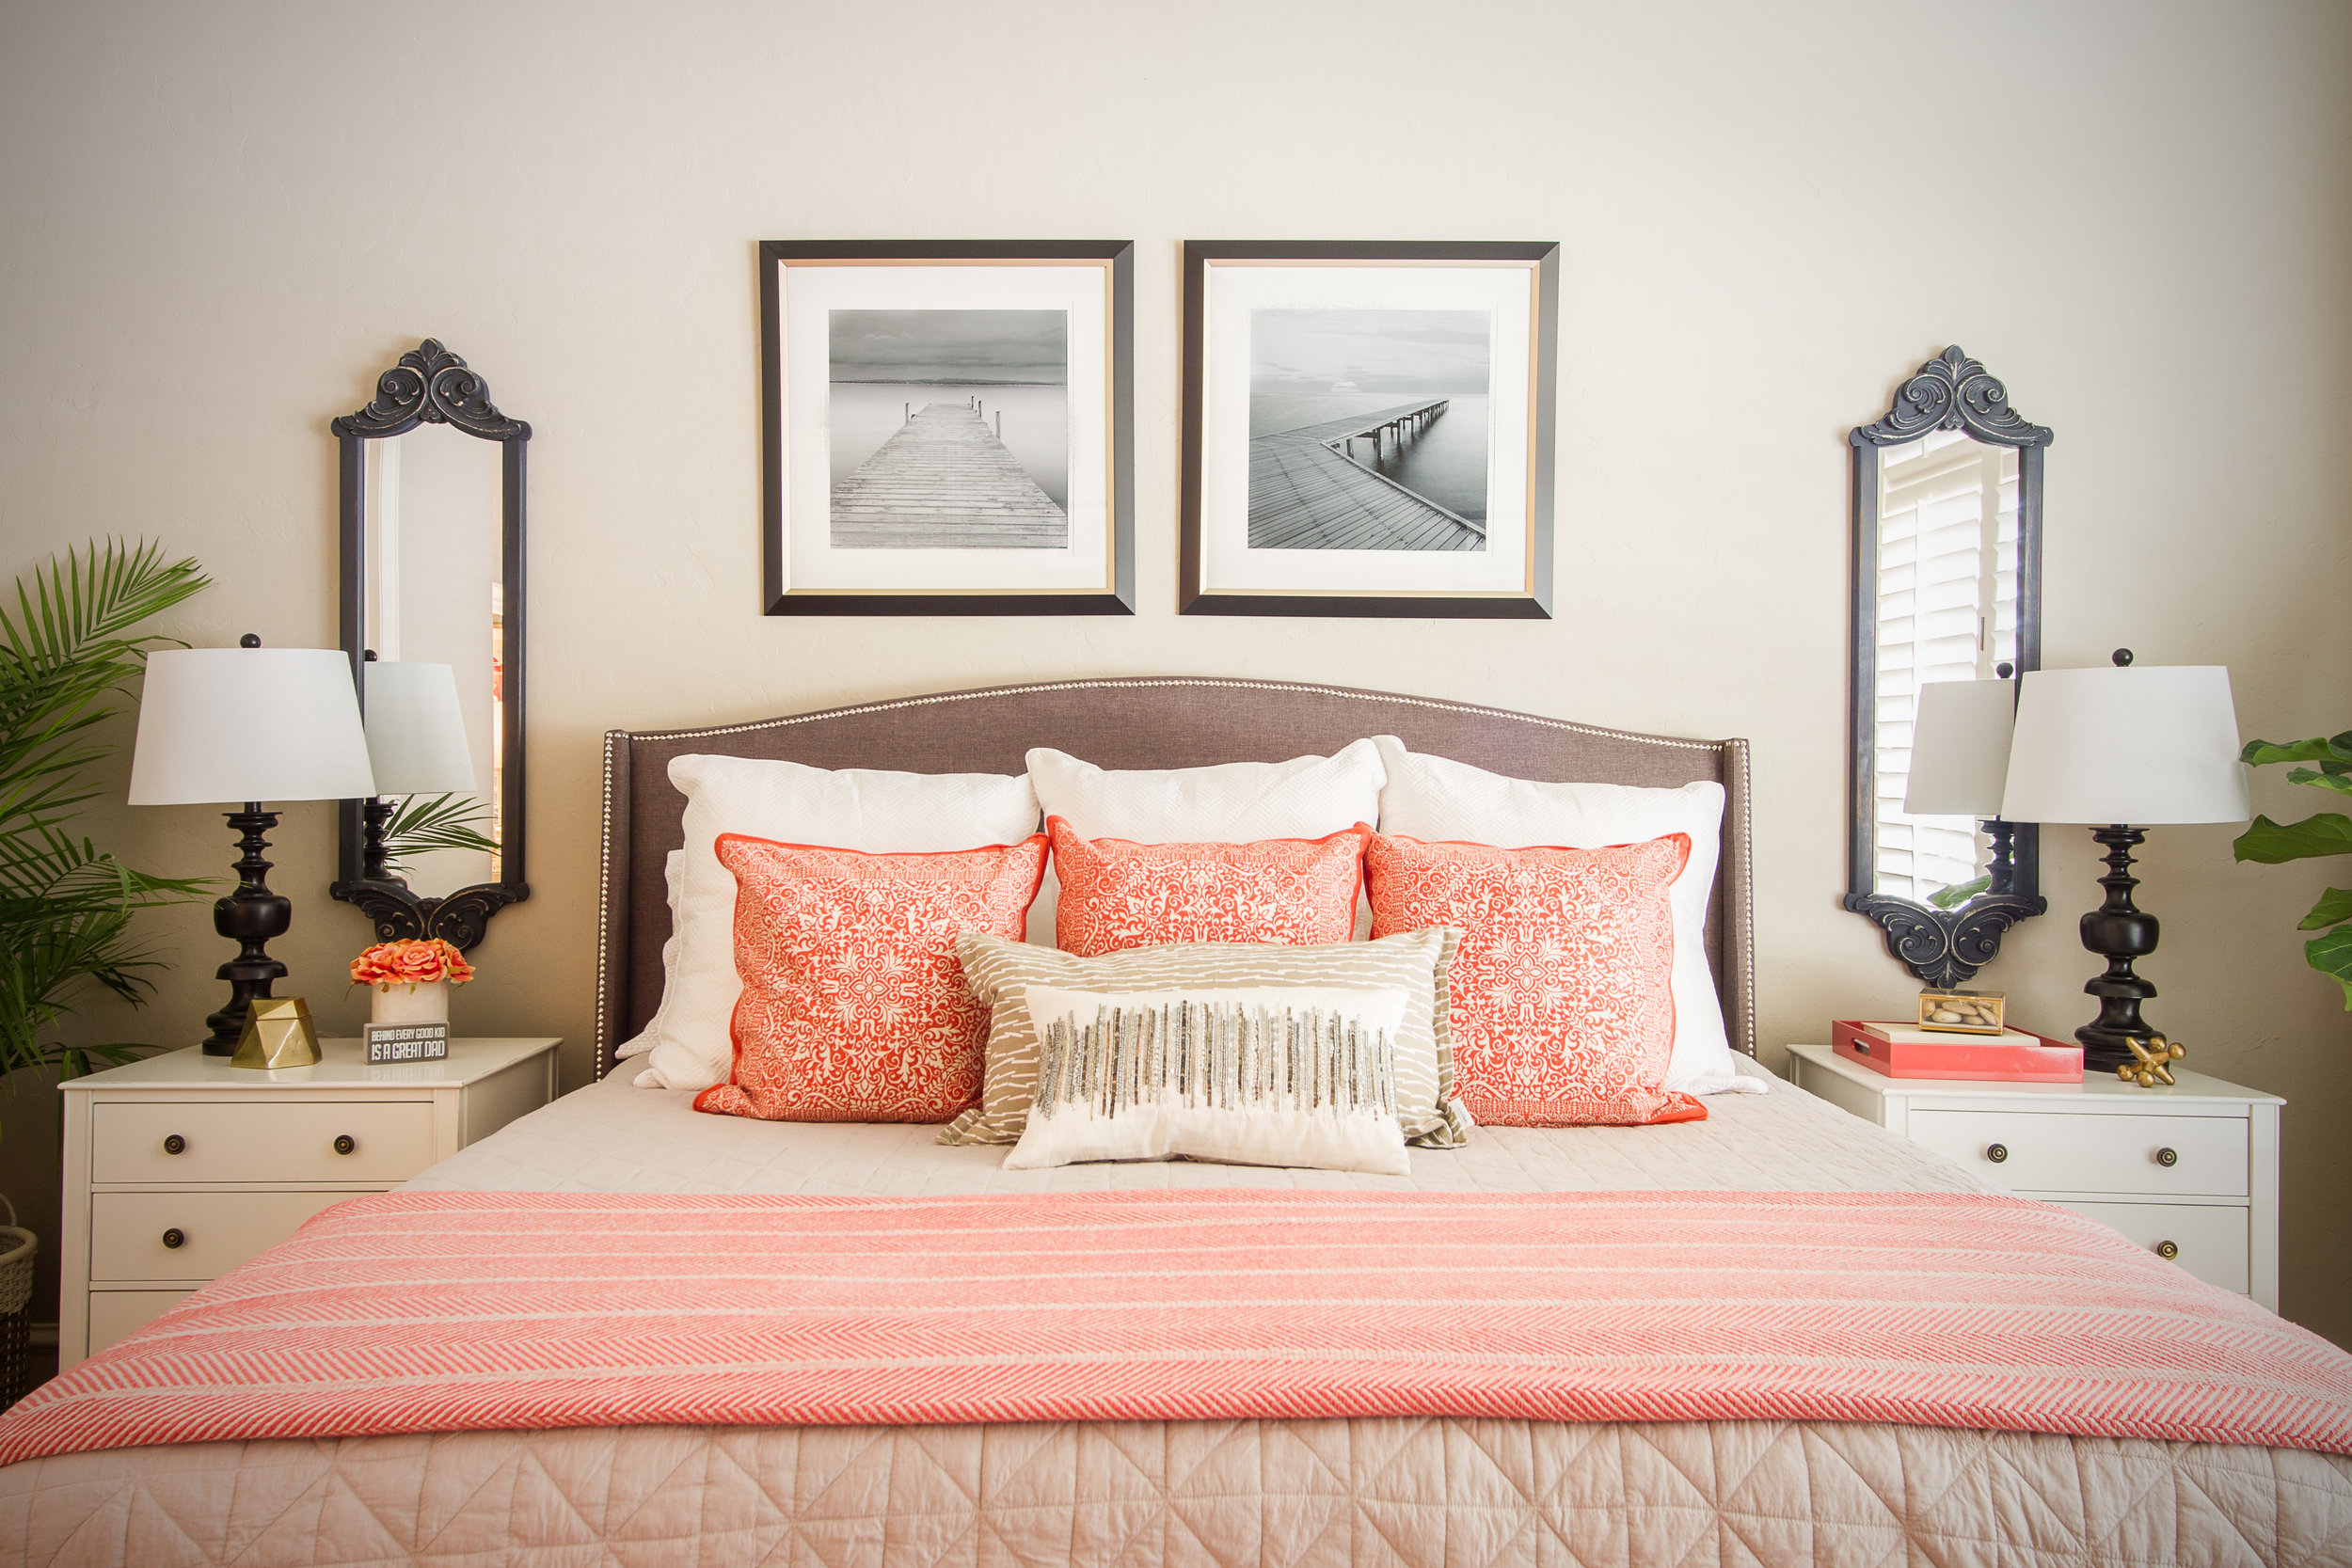 Coppell Interior Design Coral Grey Master Bedroom.jpeg